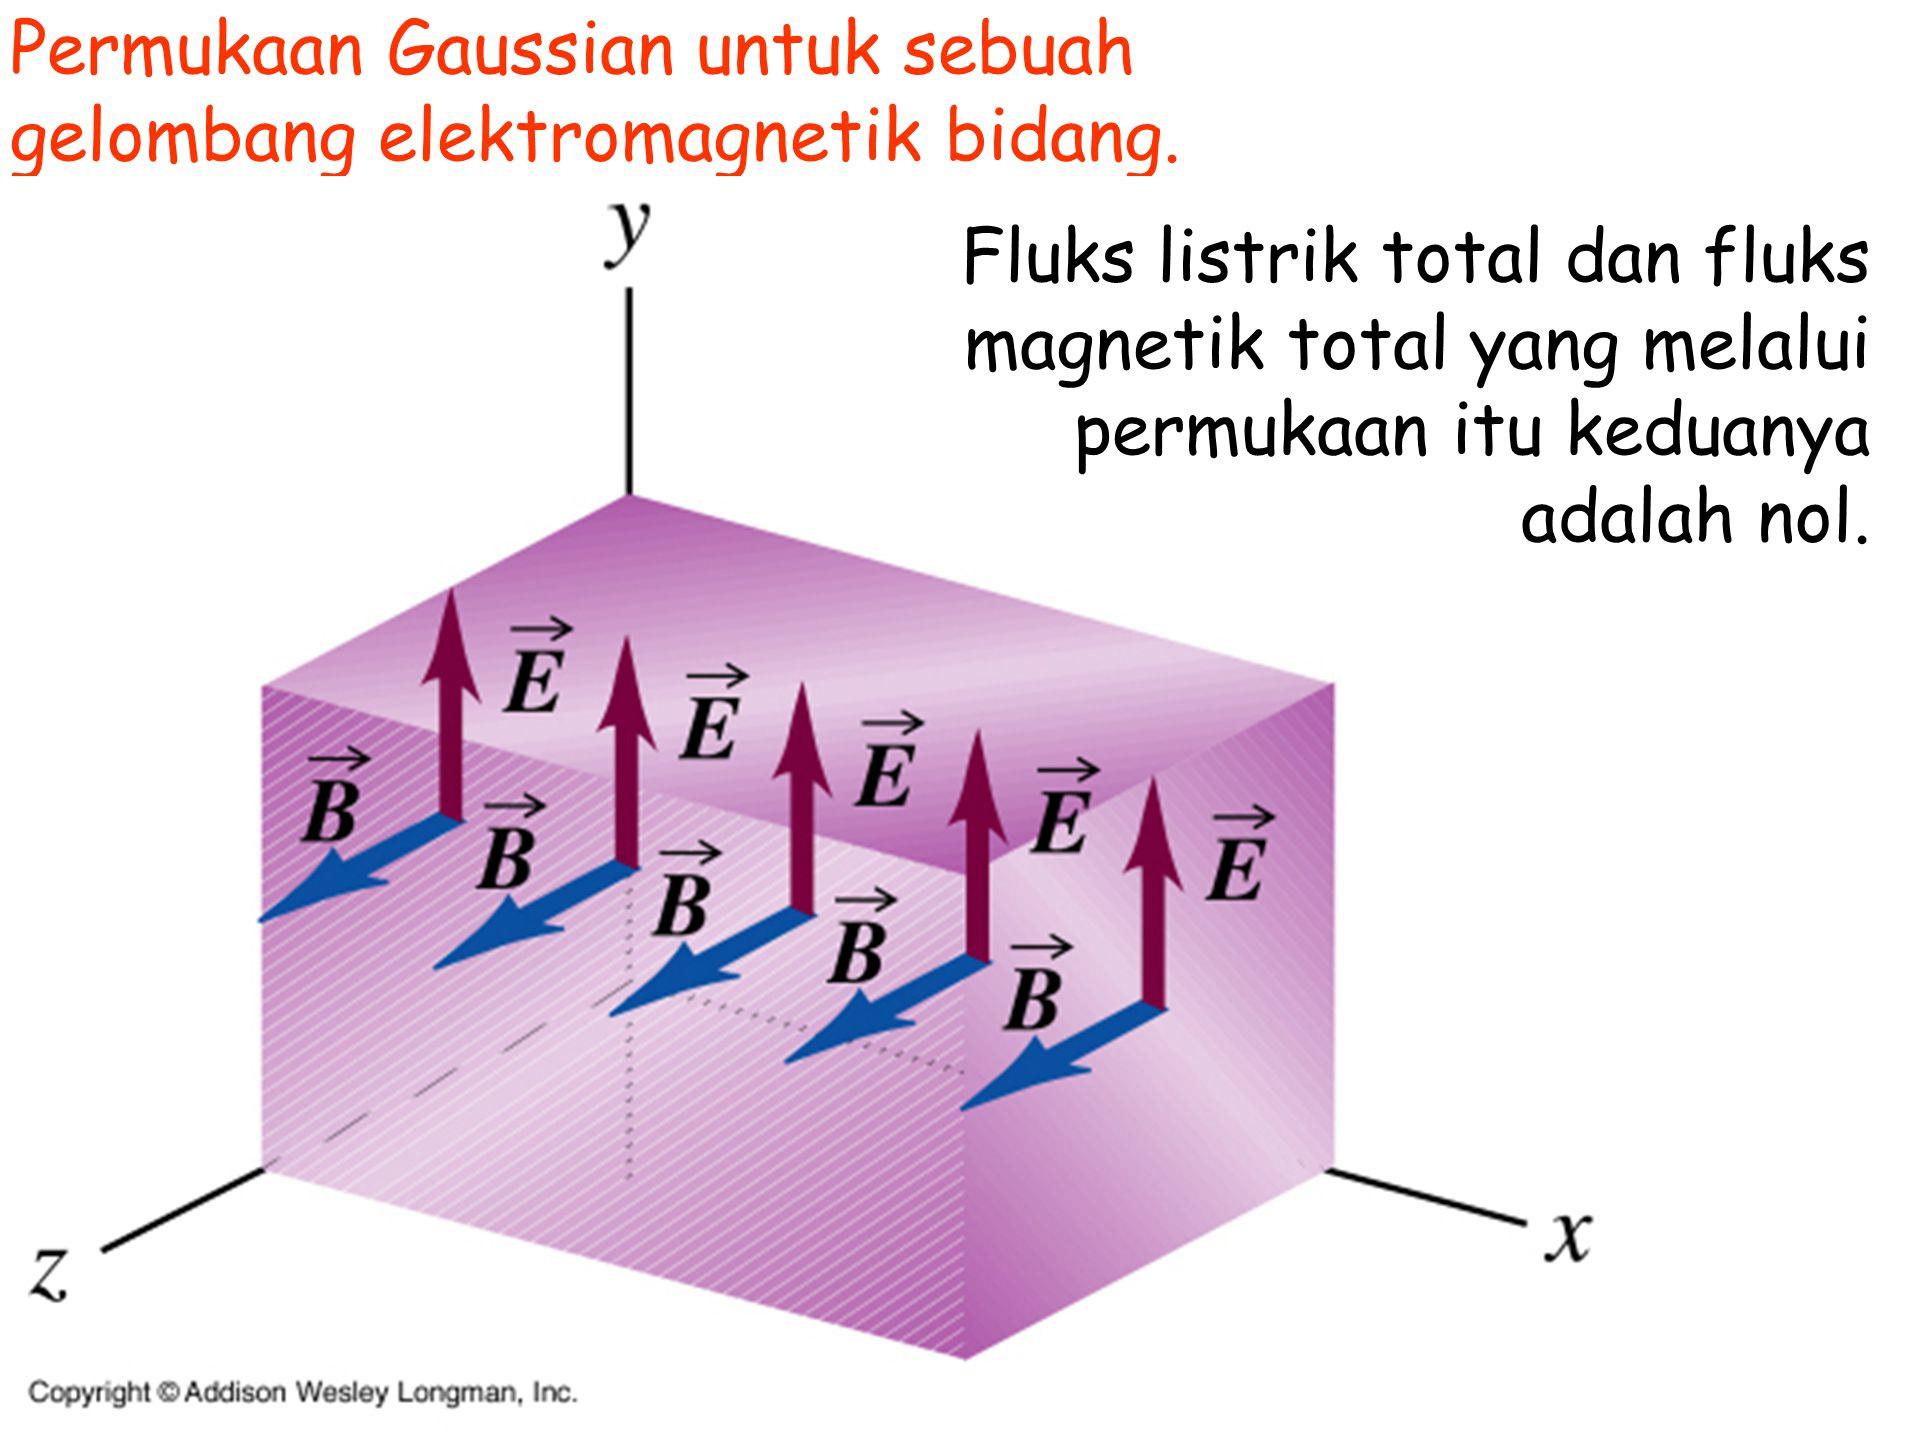 Permukaan Gaussian untuk sebuah gelombang elektromagnetik bidang.